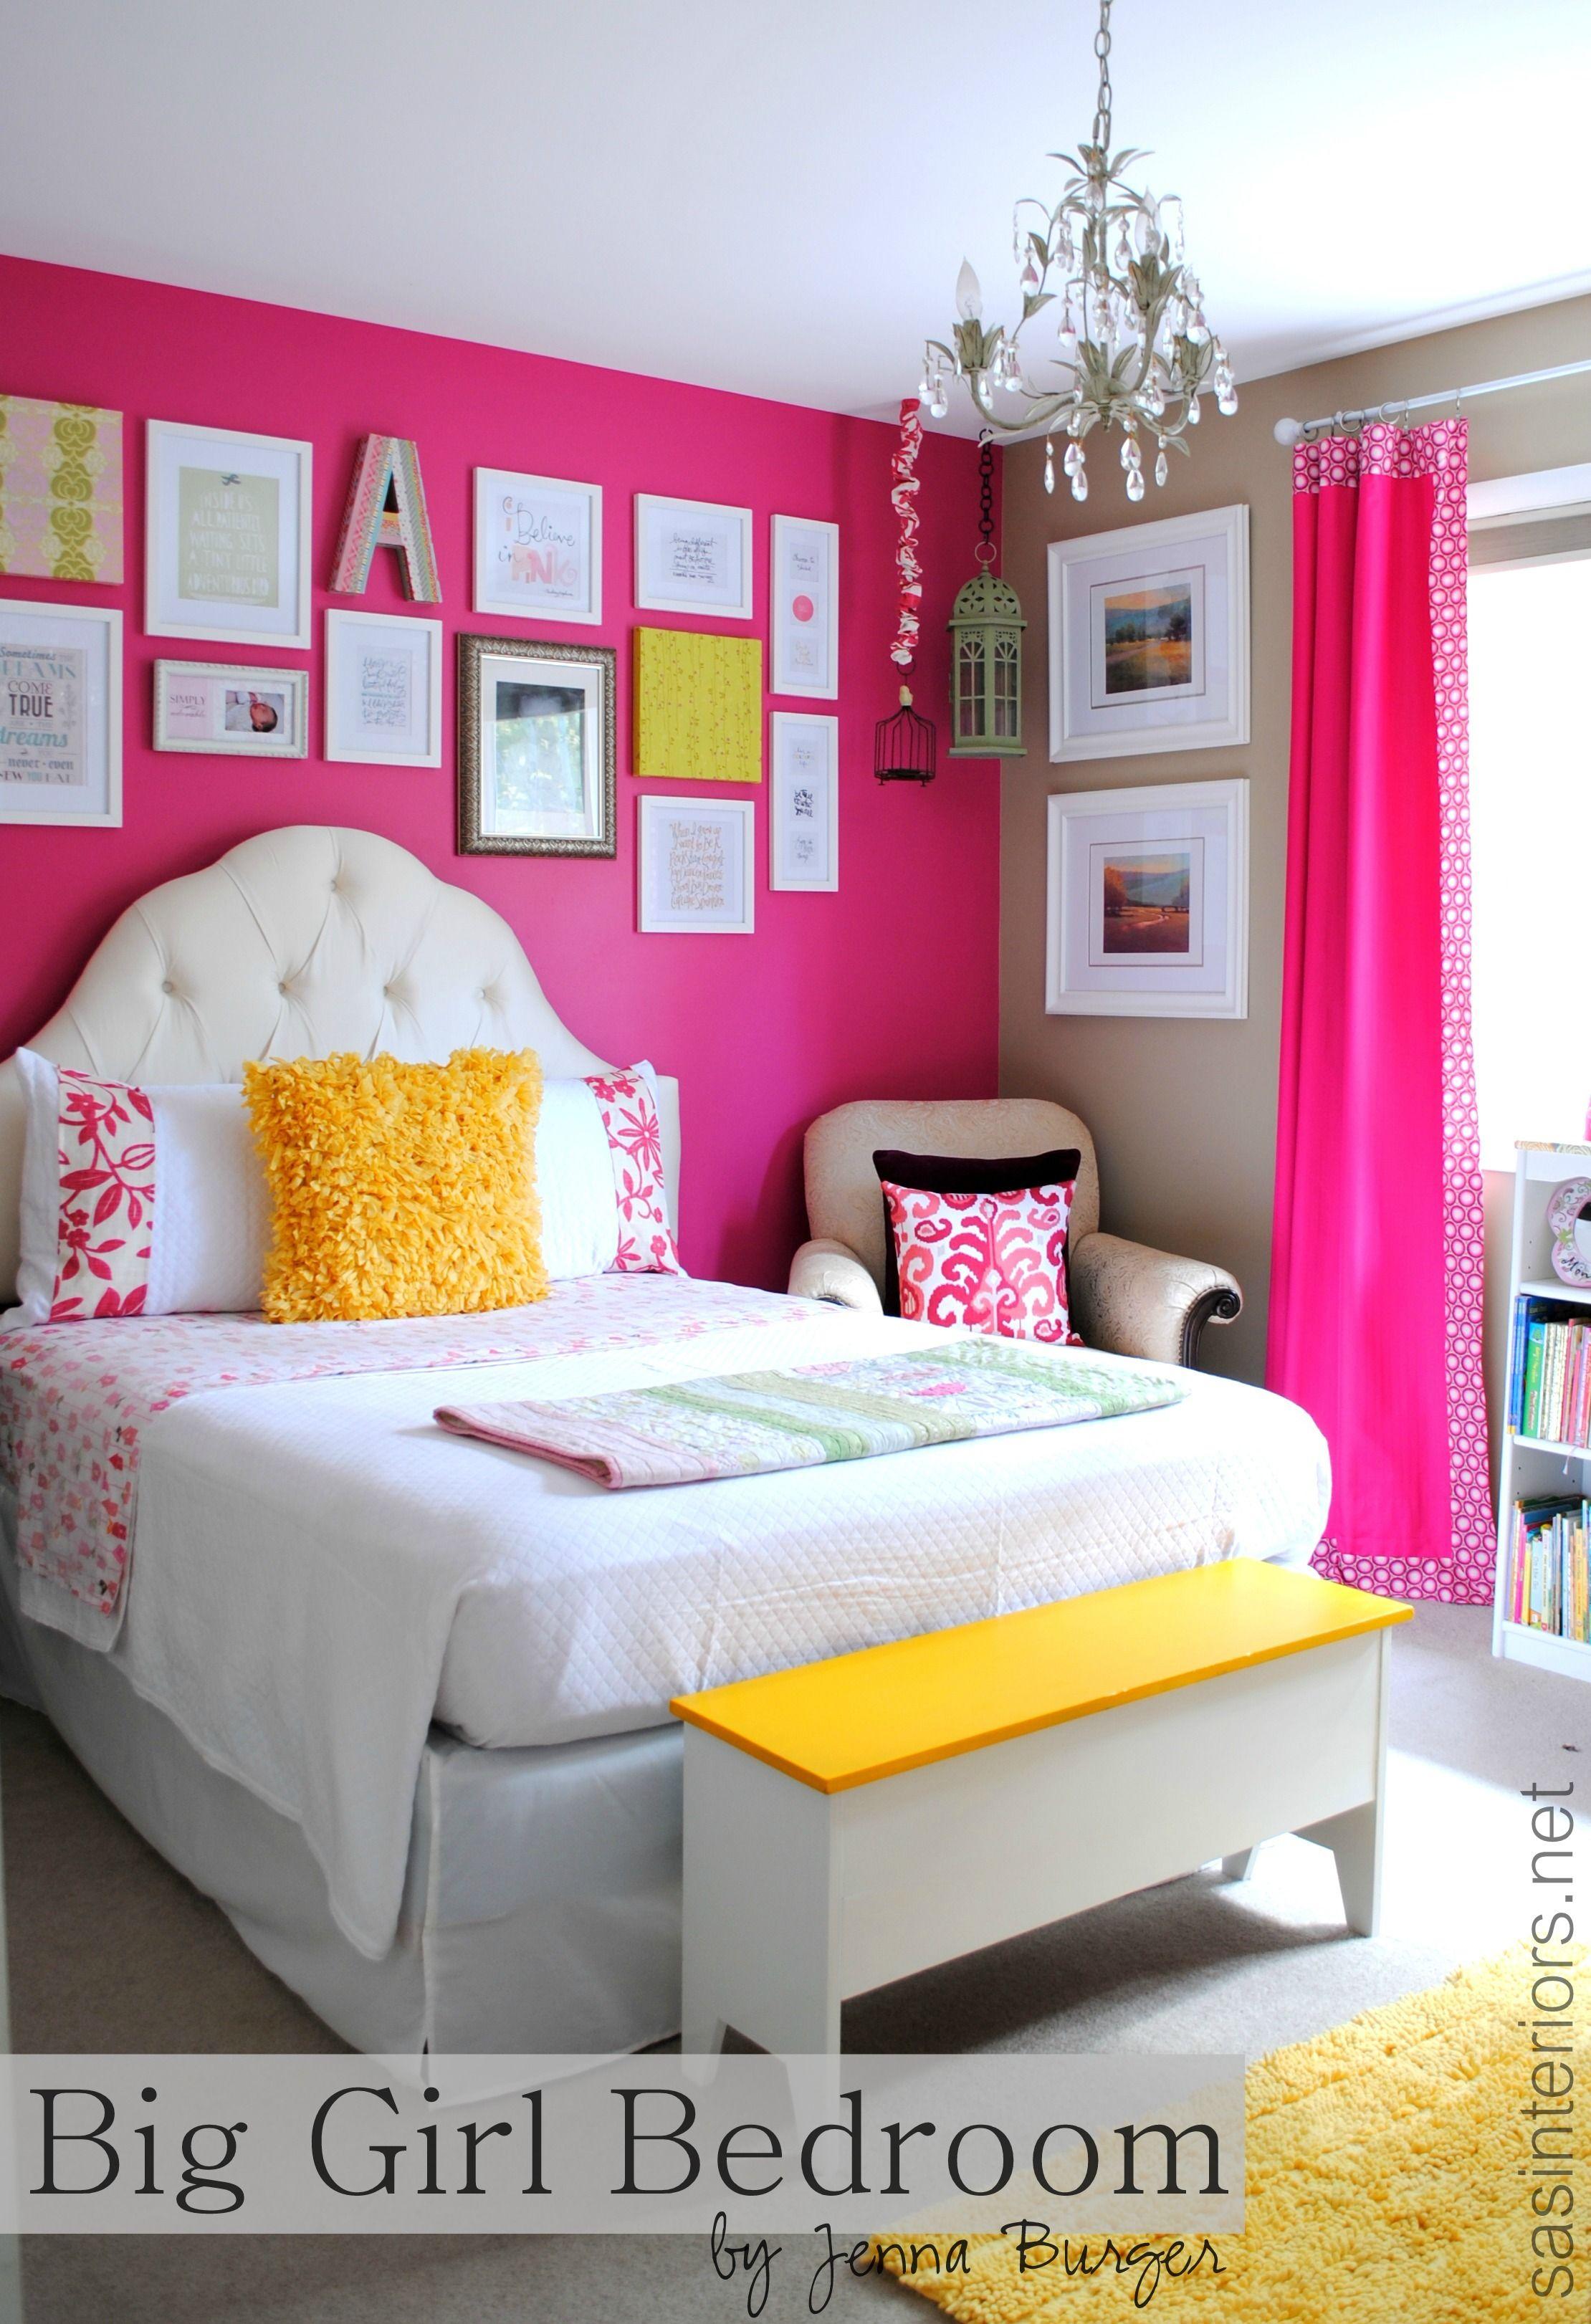 Girls Bedroom Ideas Pink living room list of things House Designer